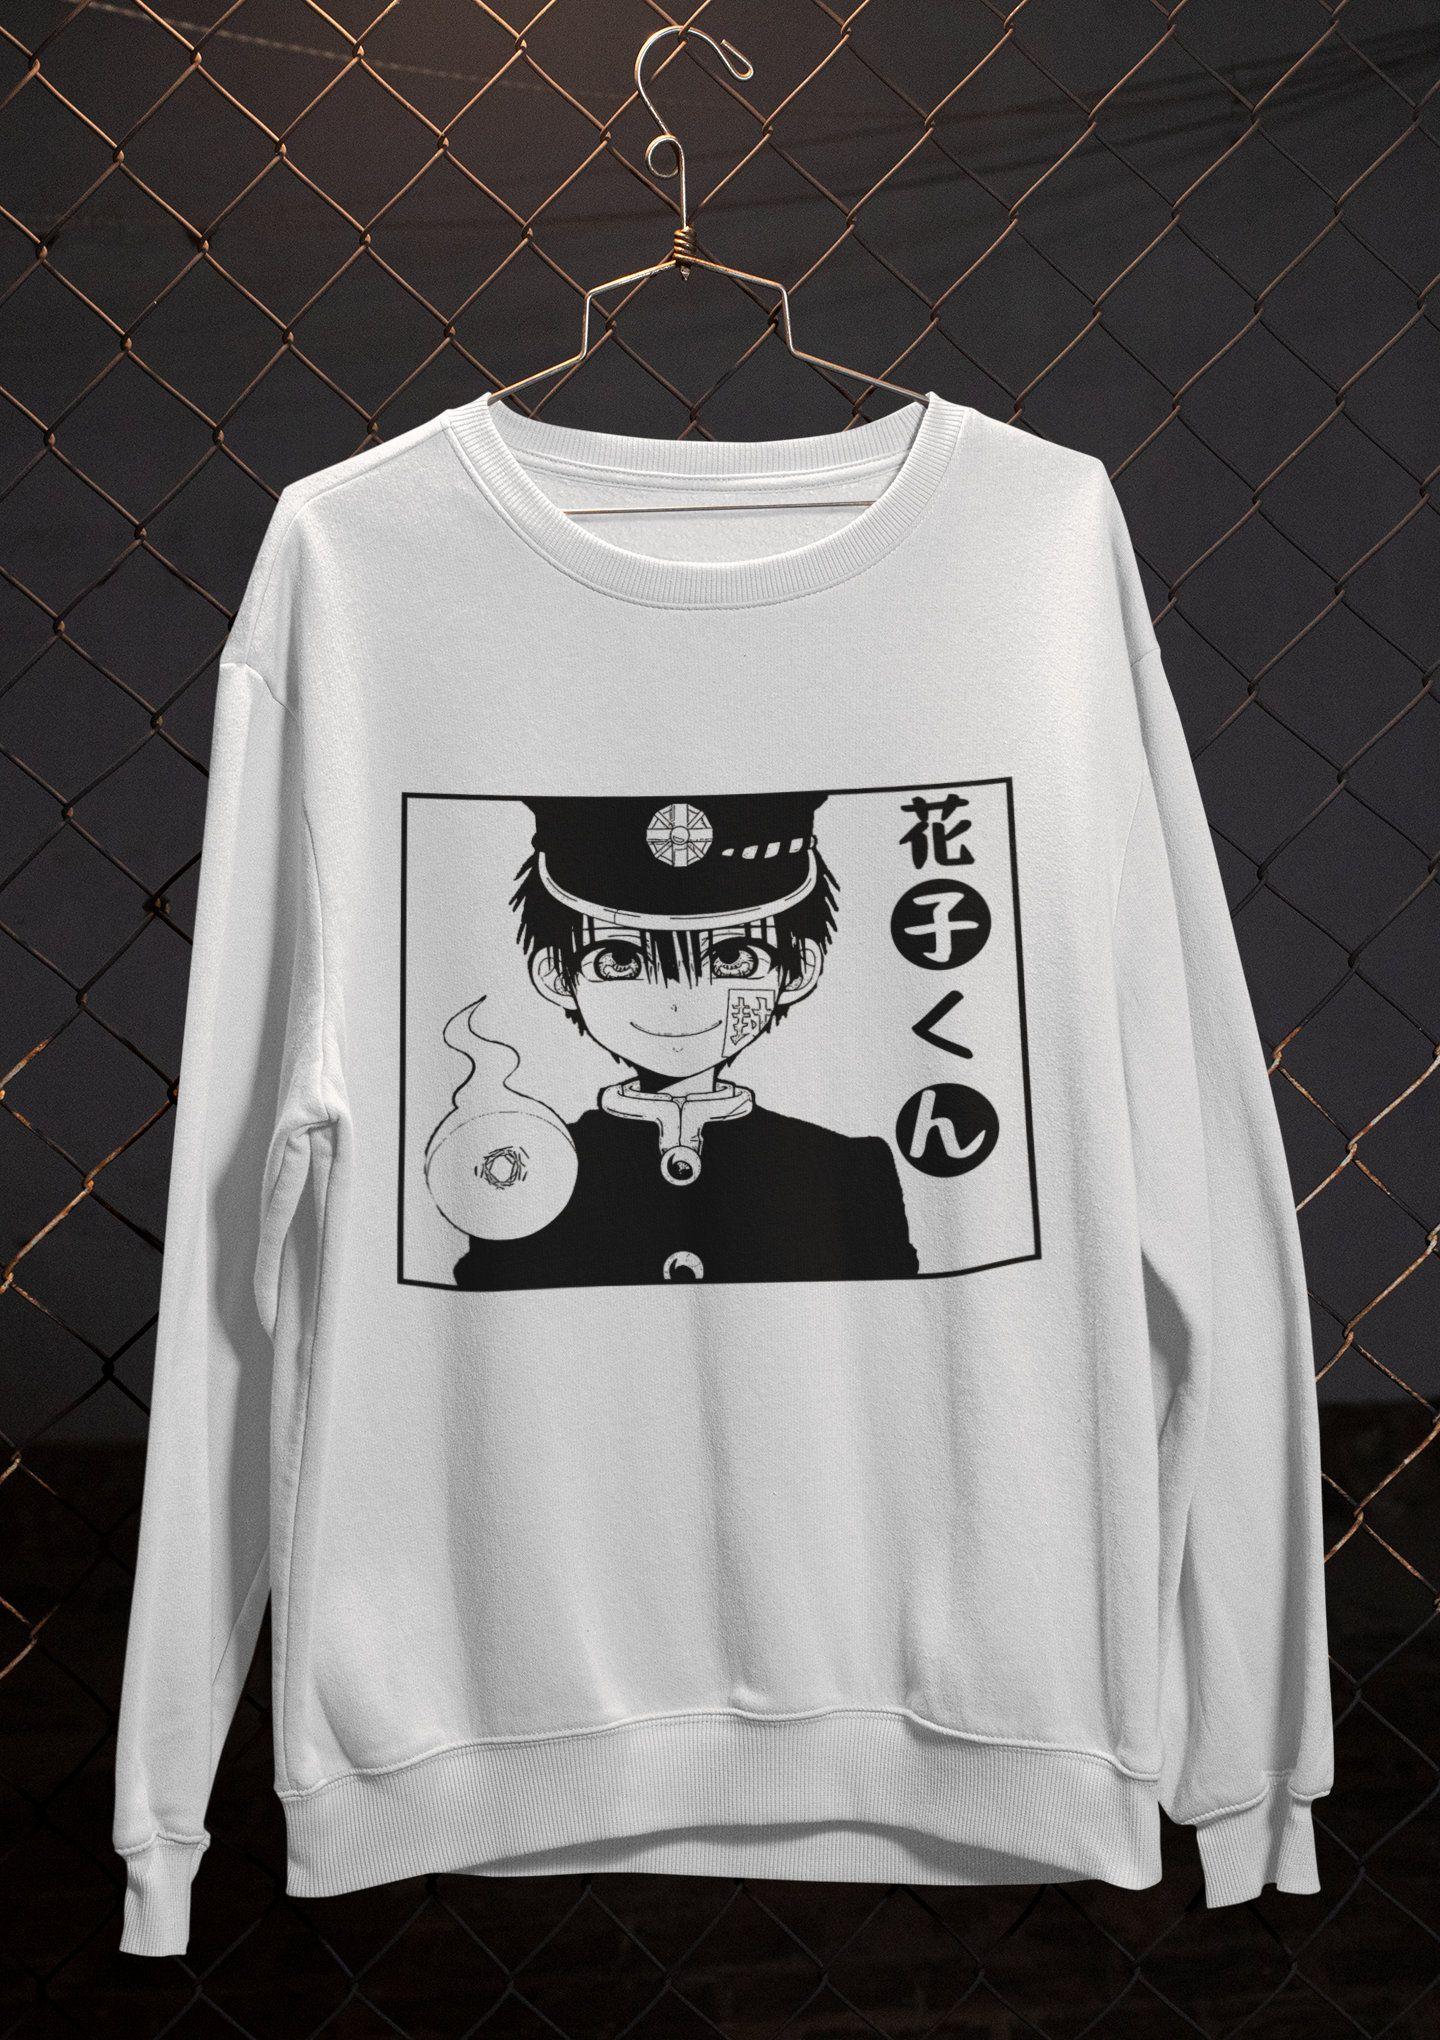 Details about  /Anime Toilet-Bound Hanako-kun Unisex Hooded Sweatshirts Coat Pullover Man/'s Tops